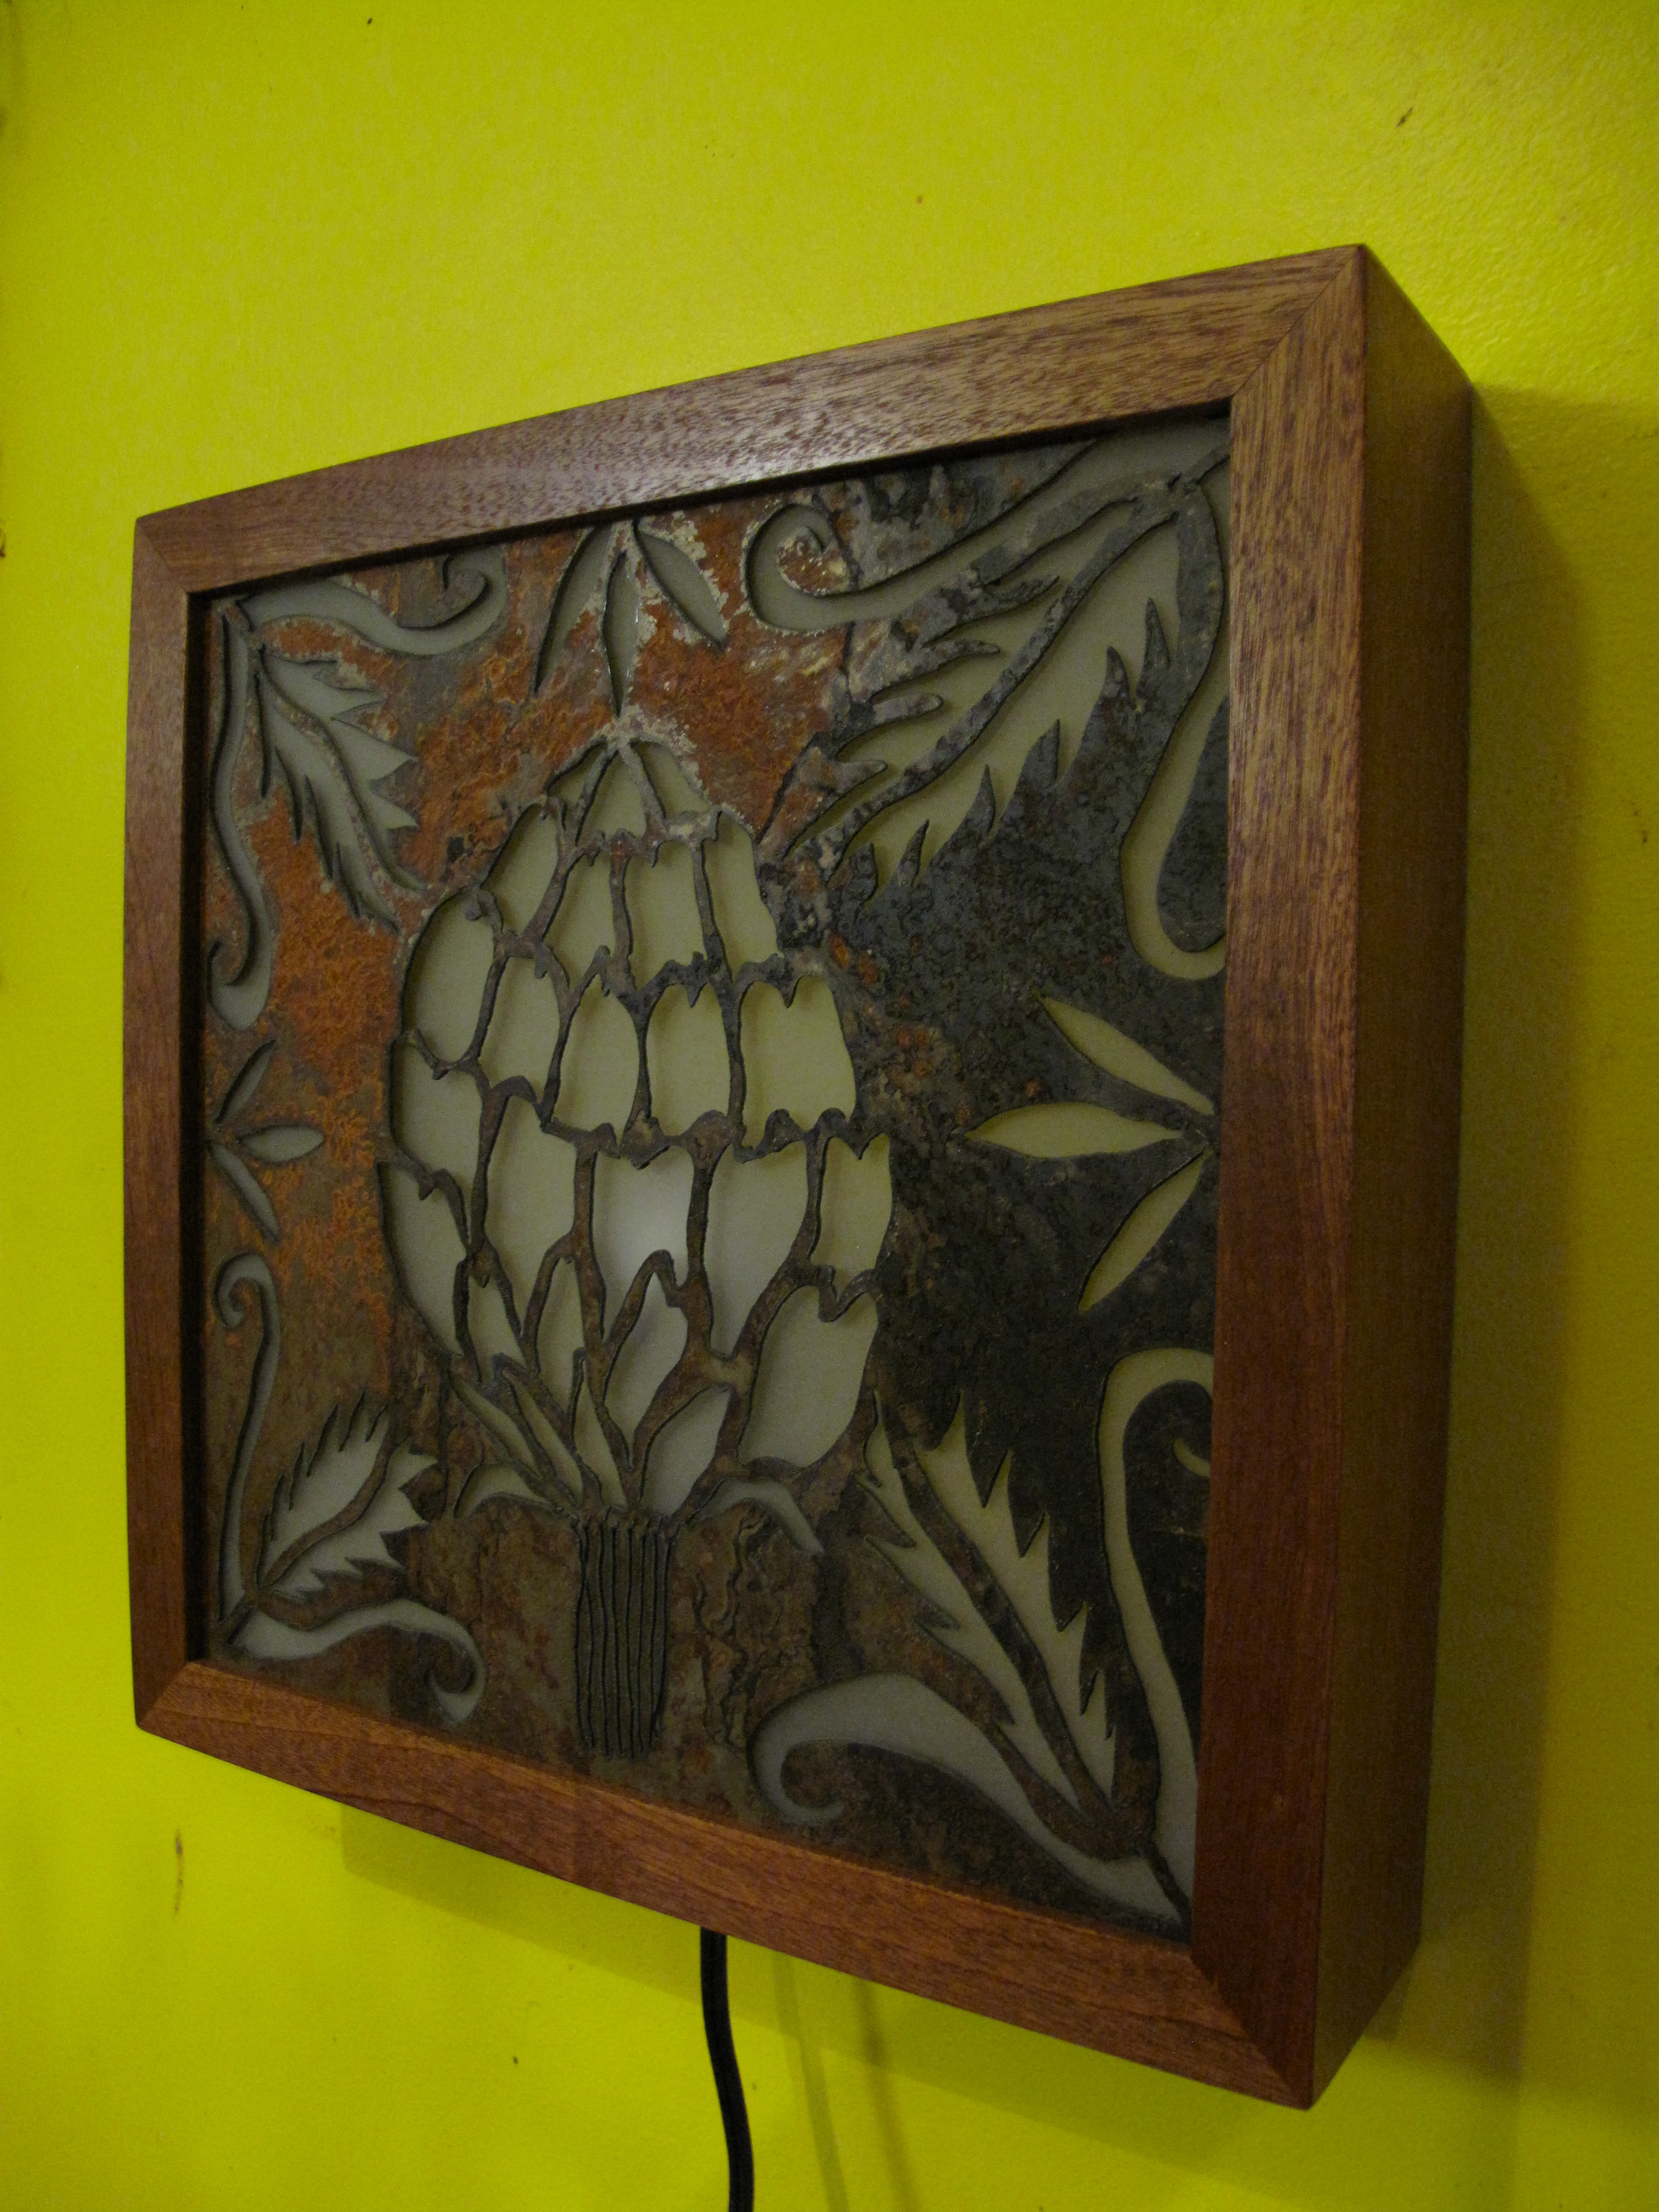 Artichoke by Elsa Hoffman - Plasma cut steel - sapele wood - plexiglass - light bulb - 13x13x3.5 - 2014 300.00